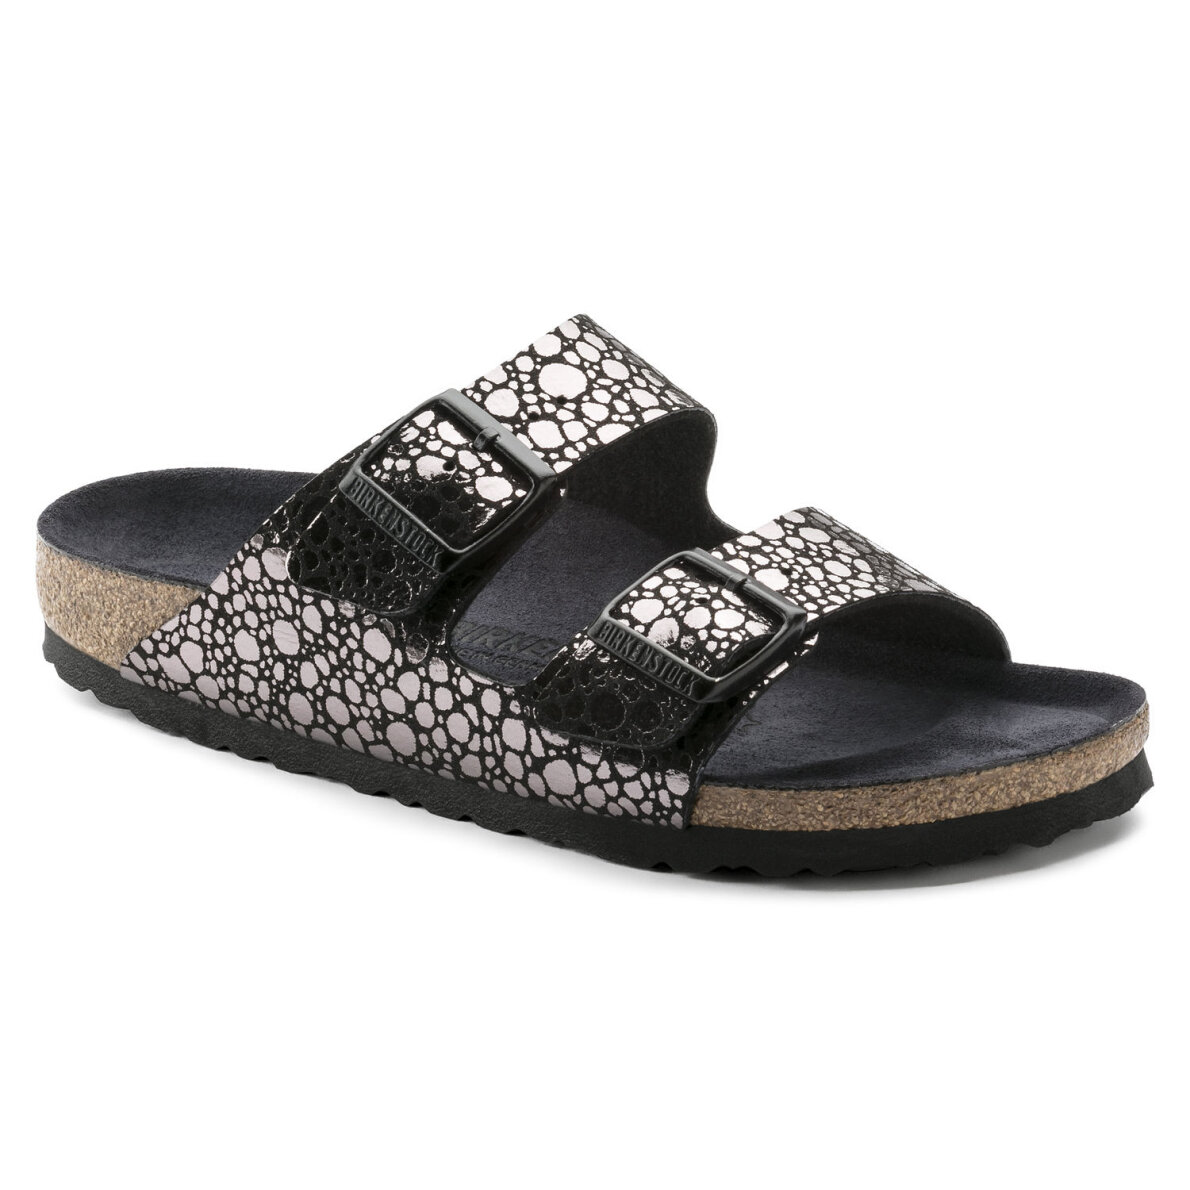 171cd70792f2 ... Birkenstock - Birkenstock Arizona Metallic Stones Black dame sandal ...